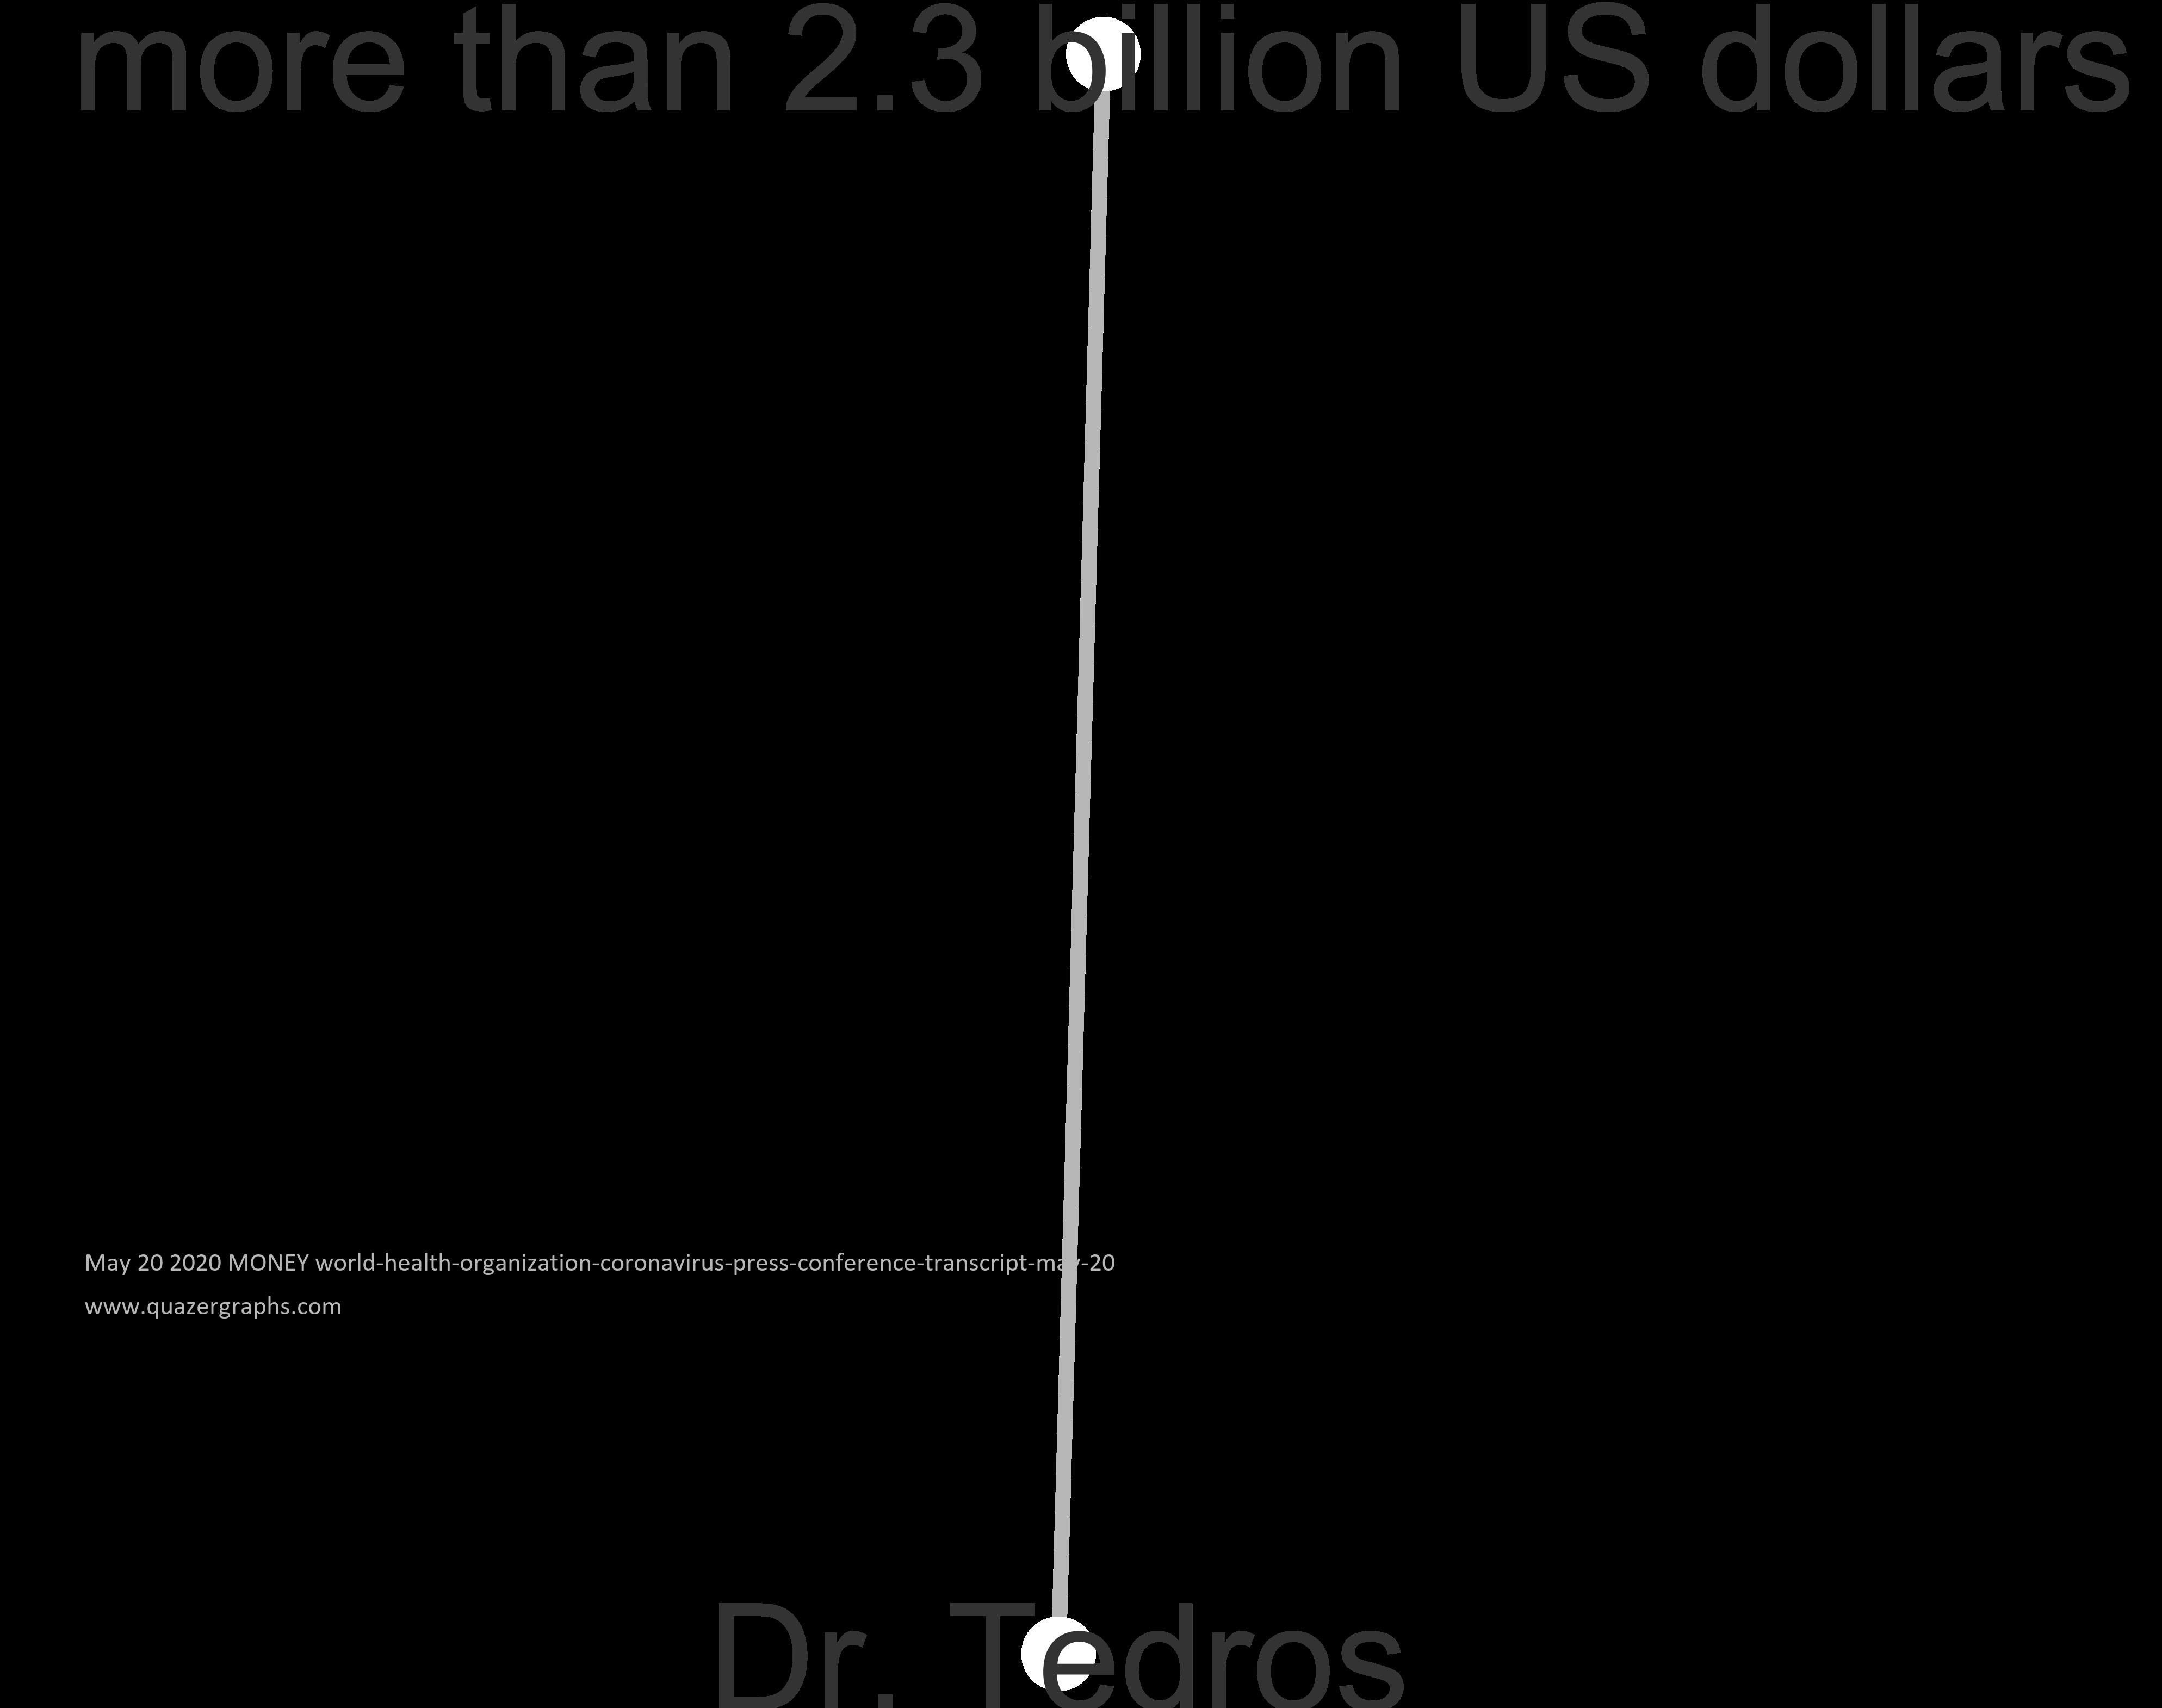 May 20 2020 MONEY world-health-organization-coronavirus-press-conference-transcript-may-20